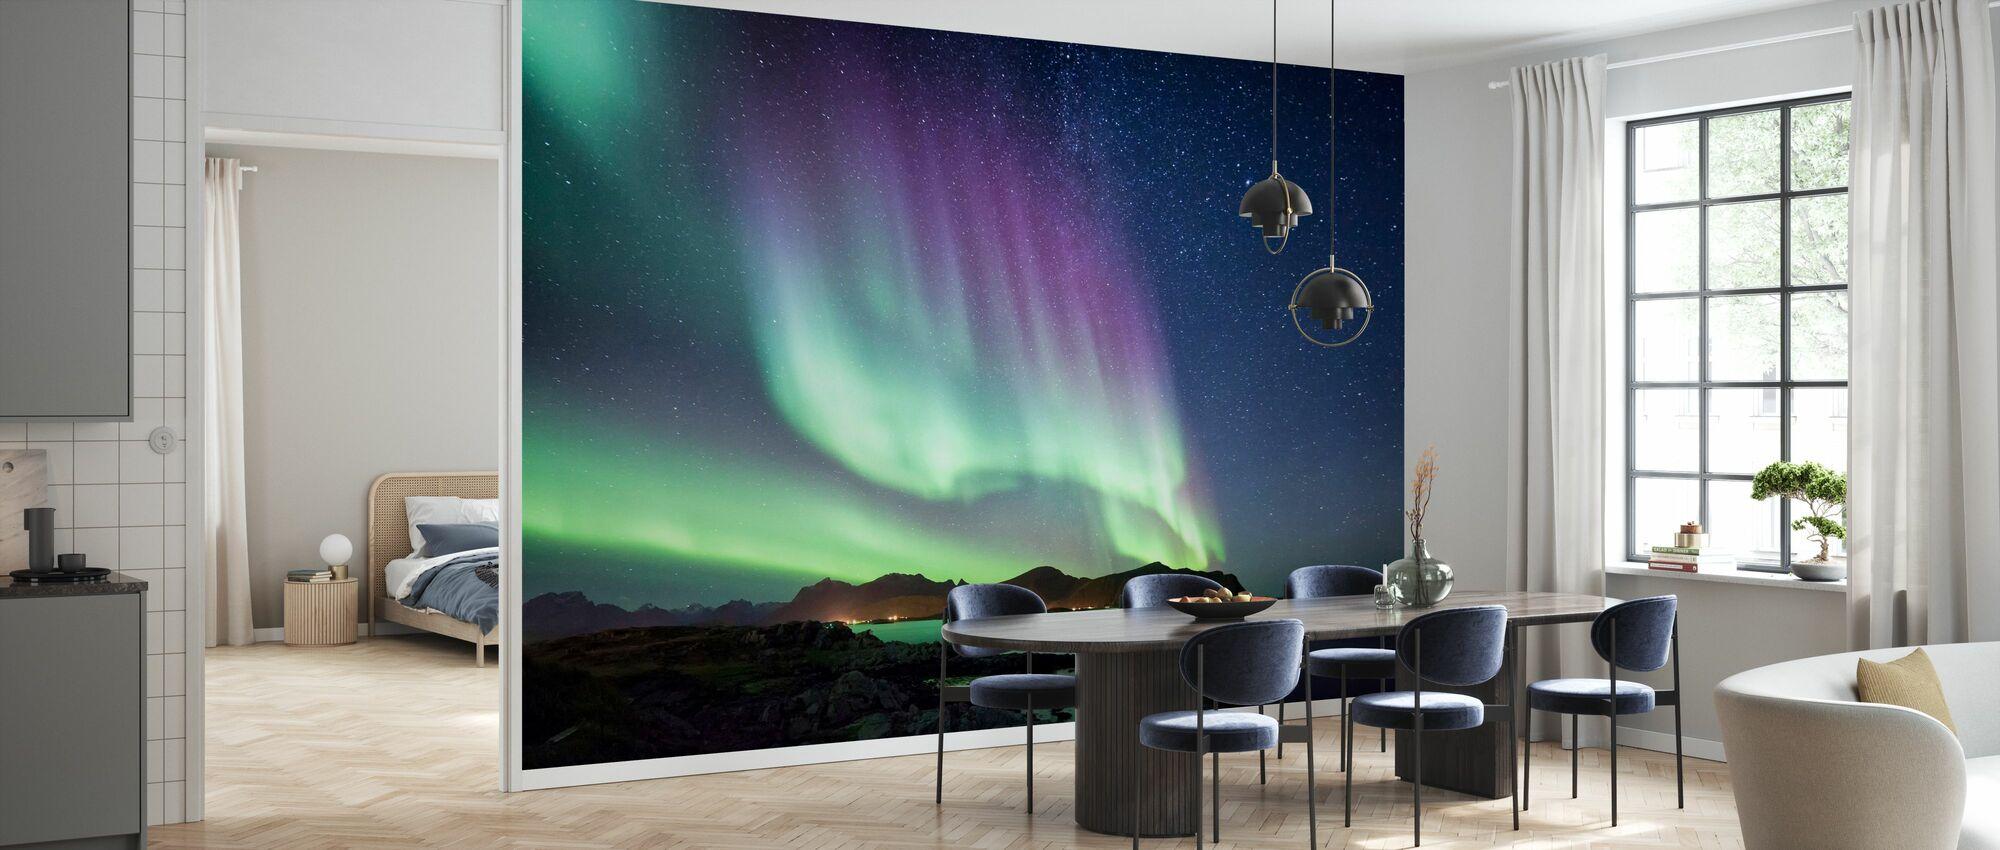 Aurora Borealis Northern Lights - Wallpaper - Kitchen